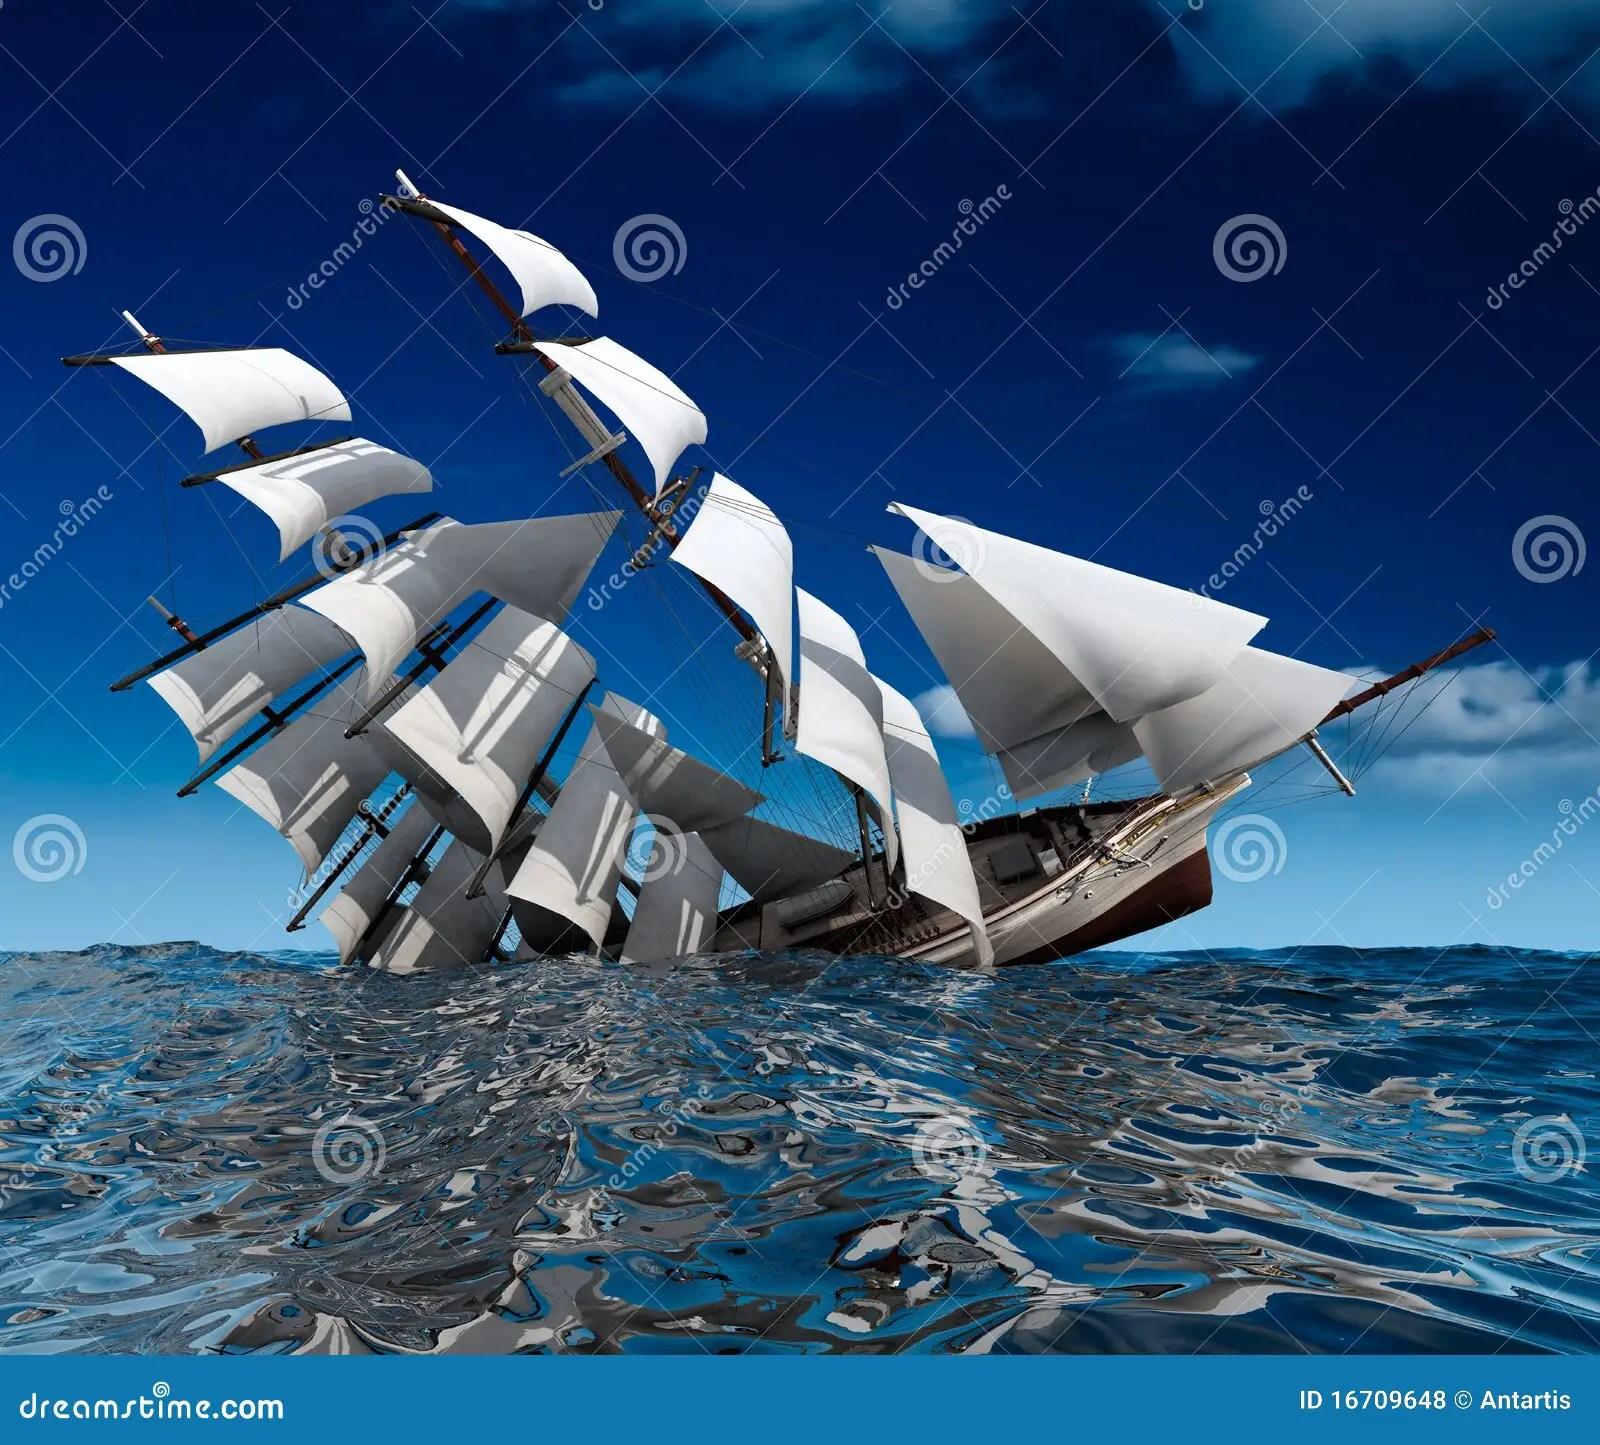 Sailing Ship Sinking Royalty Free Stock Photos